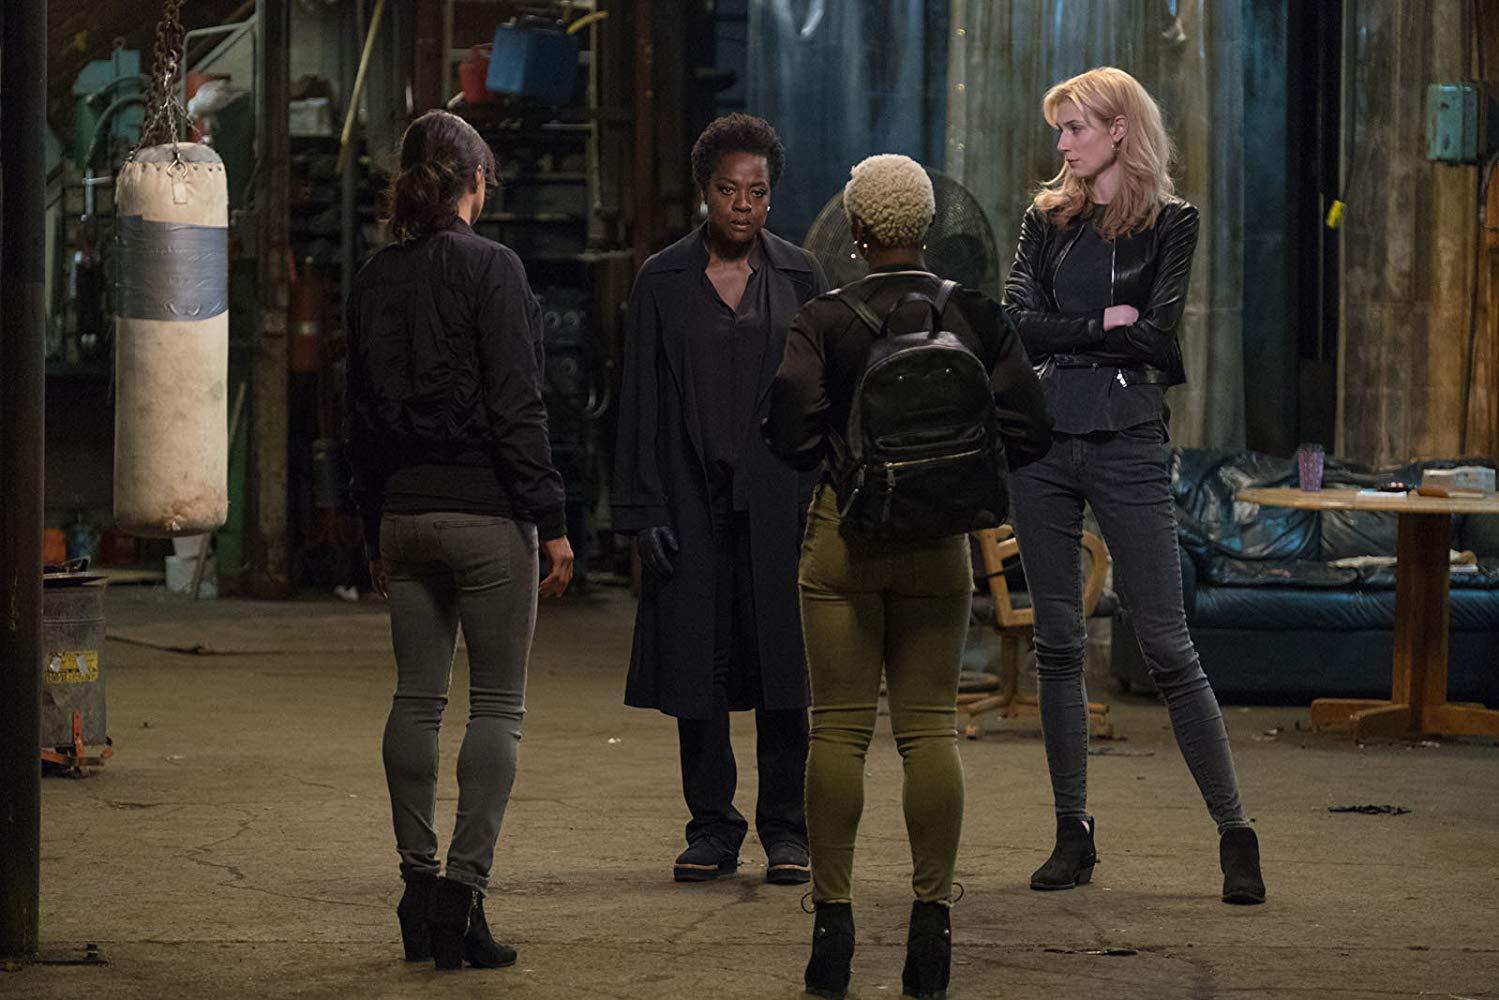 Left to right: Elizabeth Debicki, Viola Davis, Michelle Rodriguez and Cynthia Erivo in